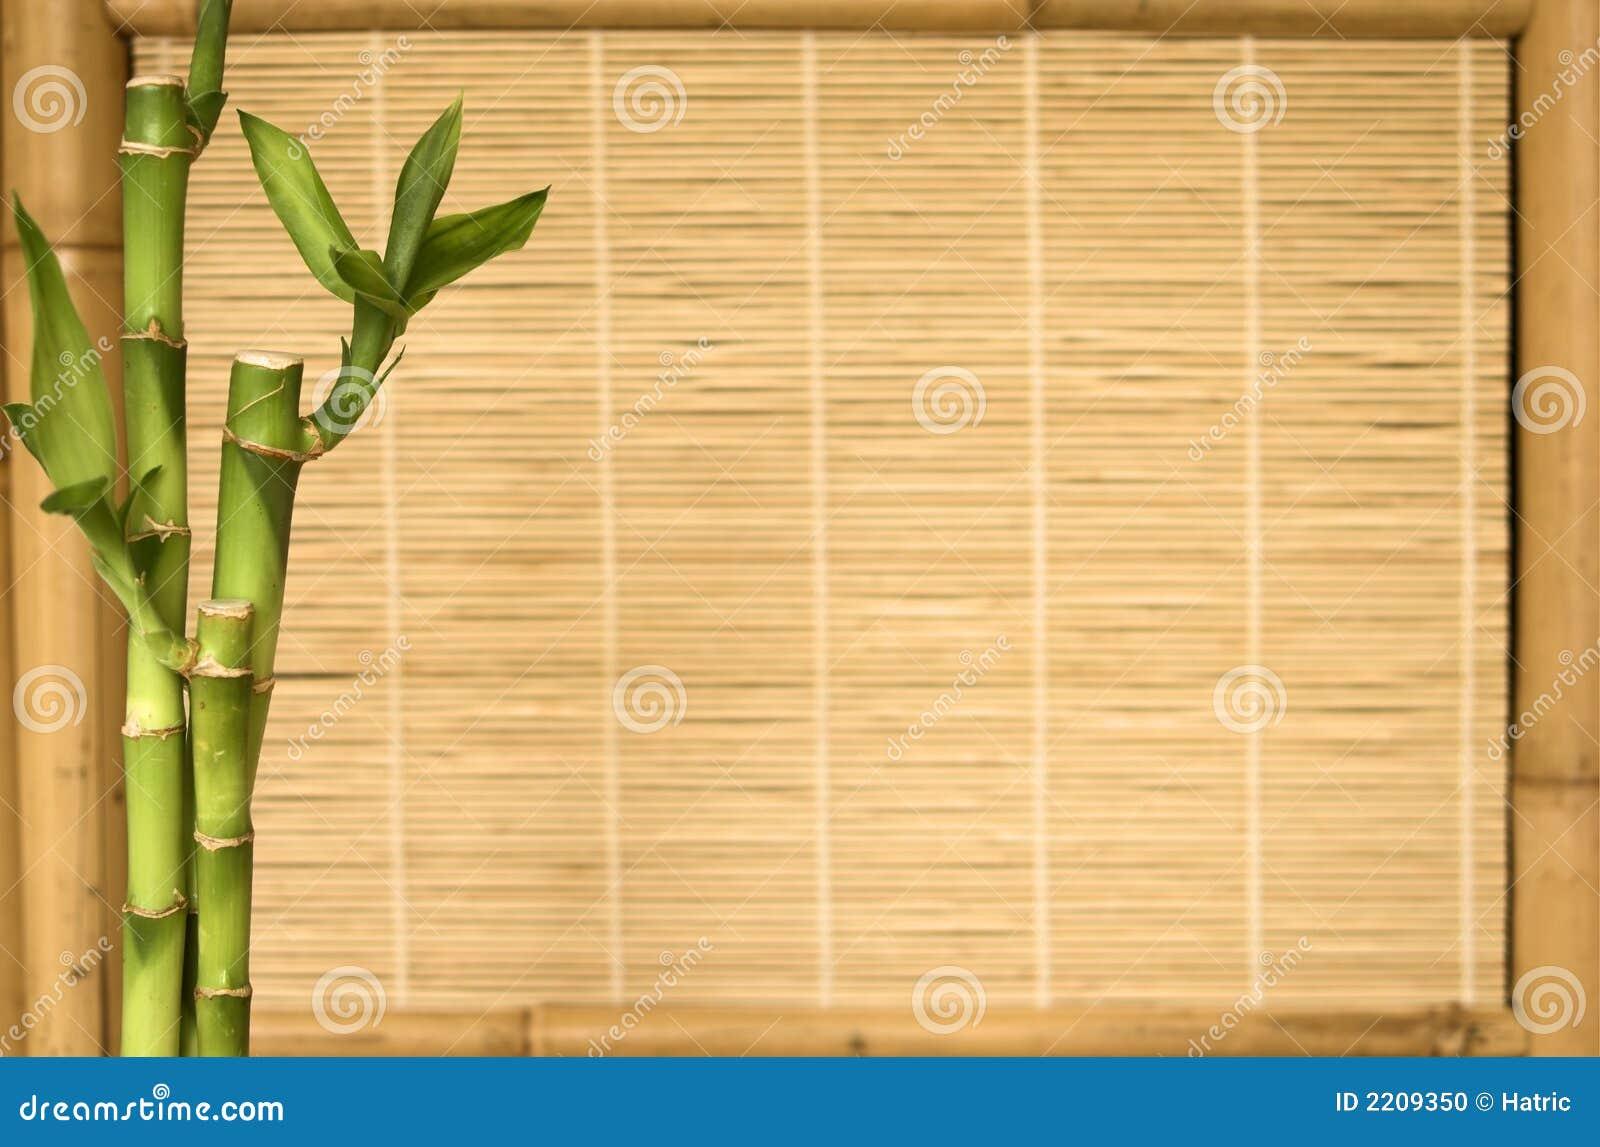 Background Series Bamboo Plant Stock Photo - Image: 2209350